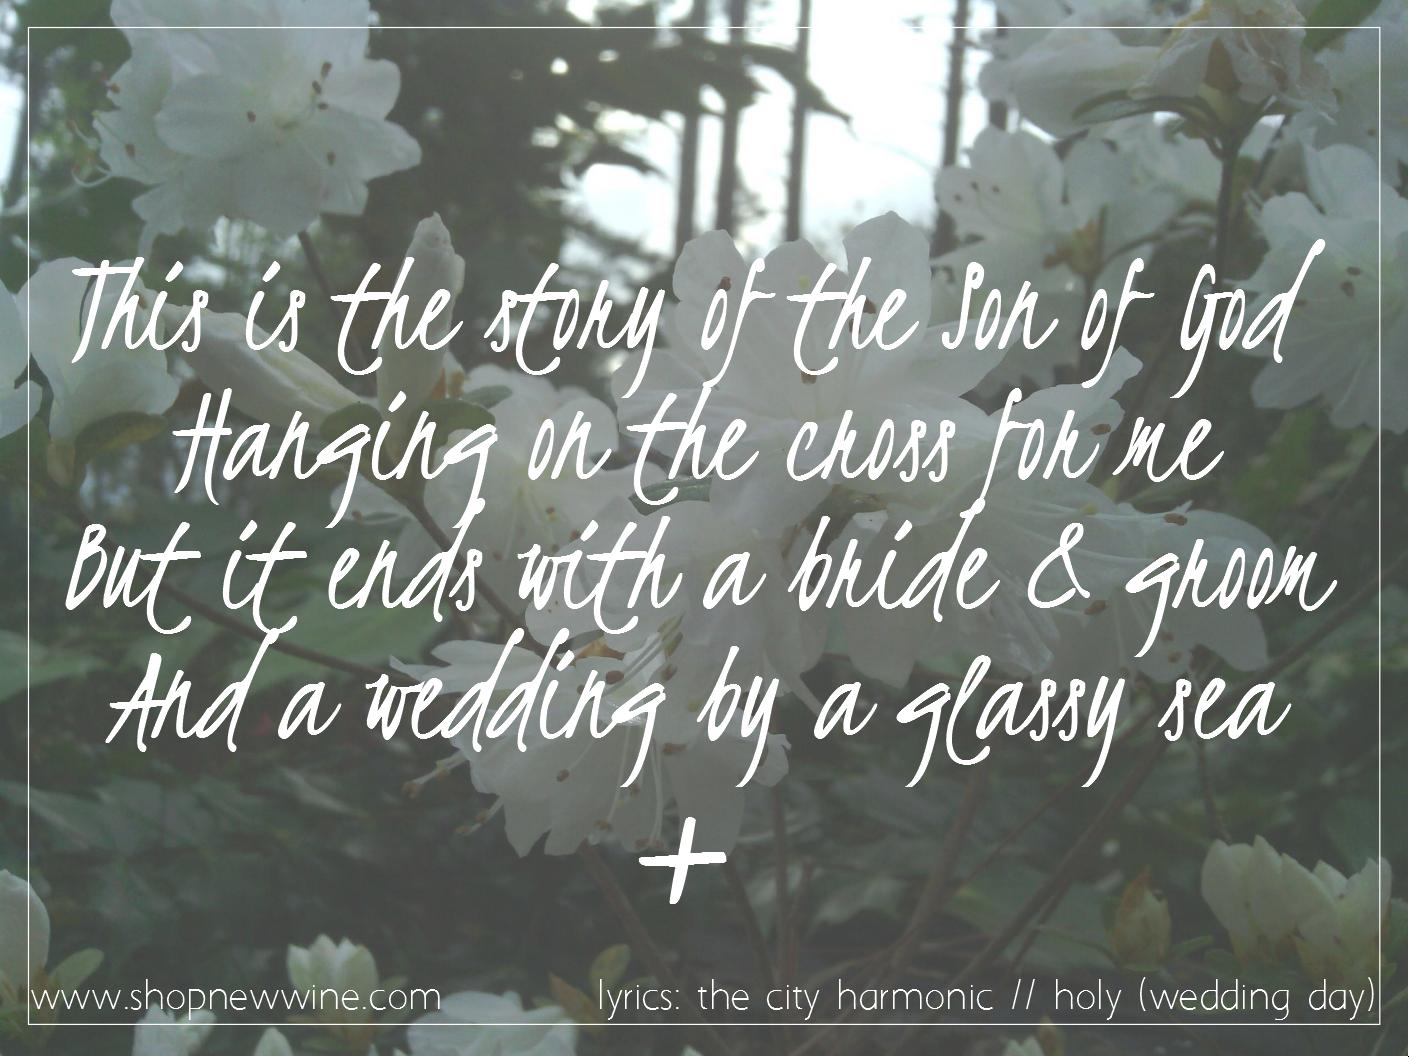 Holy Wedding Day Lyrics Simply Perf Facebook Shopnewwine